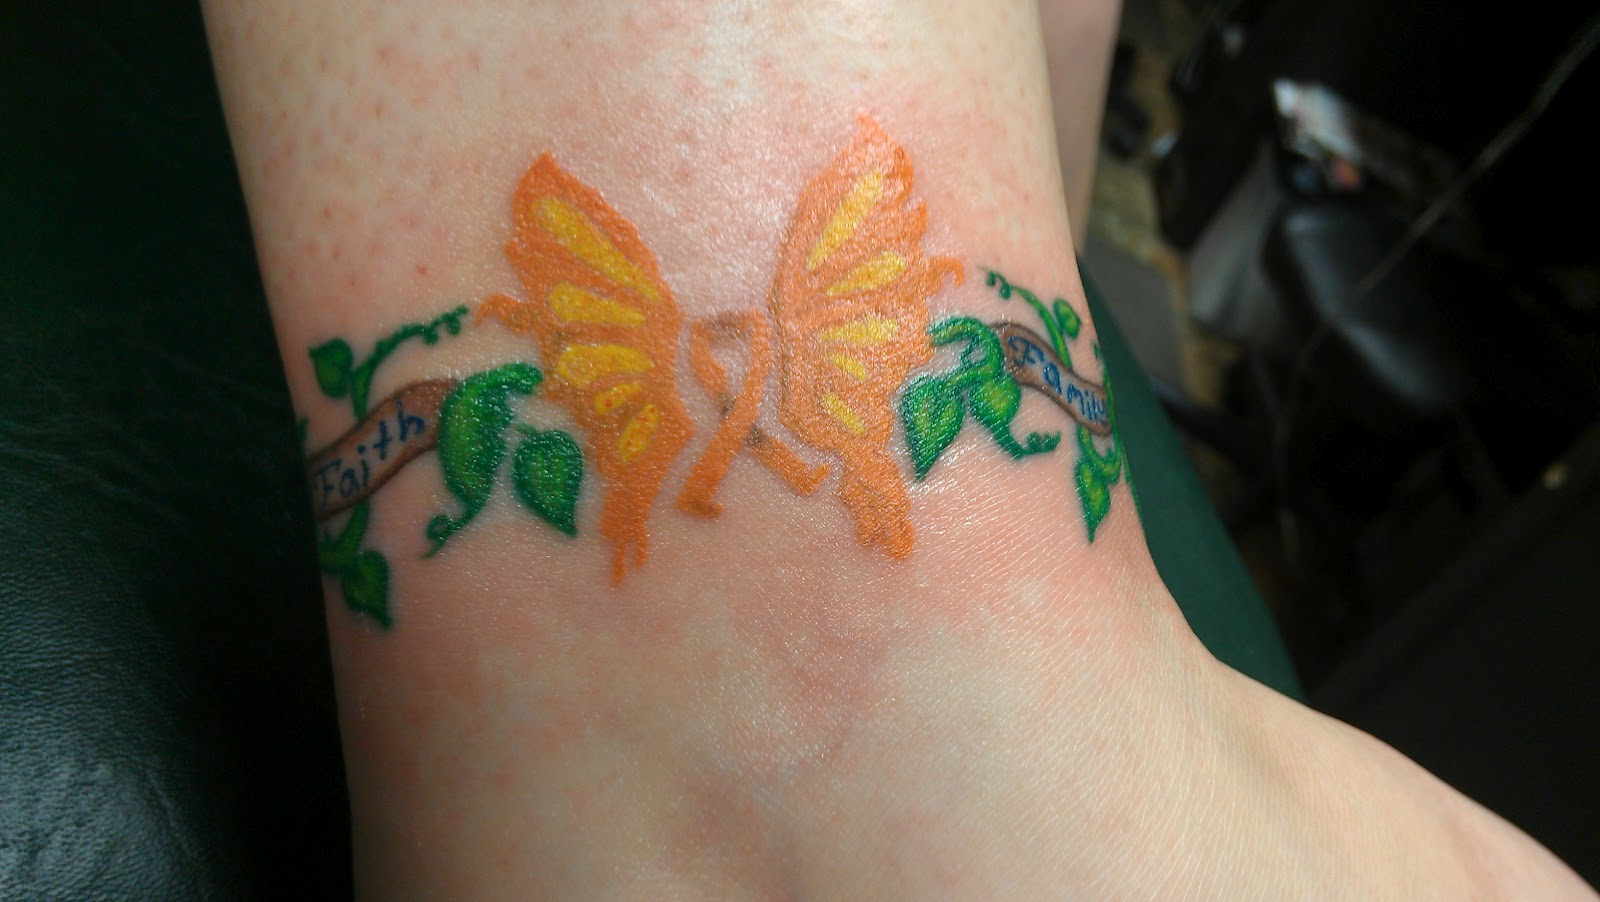 Name Tattoos On Arm Matt Holts Tattoo Blog 80228 Jpg